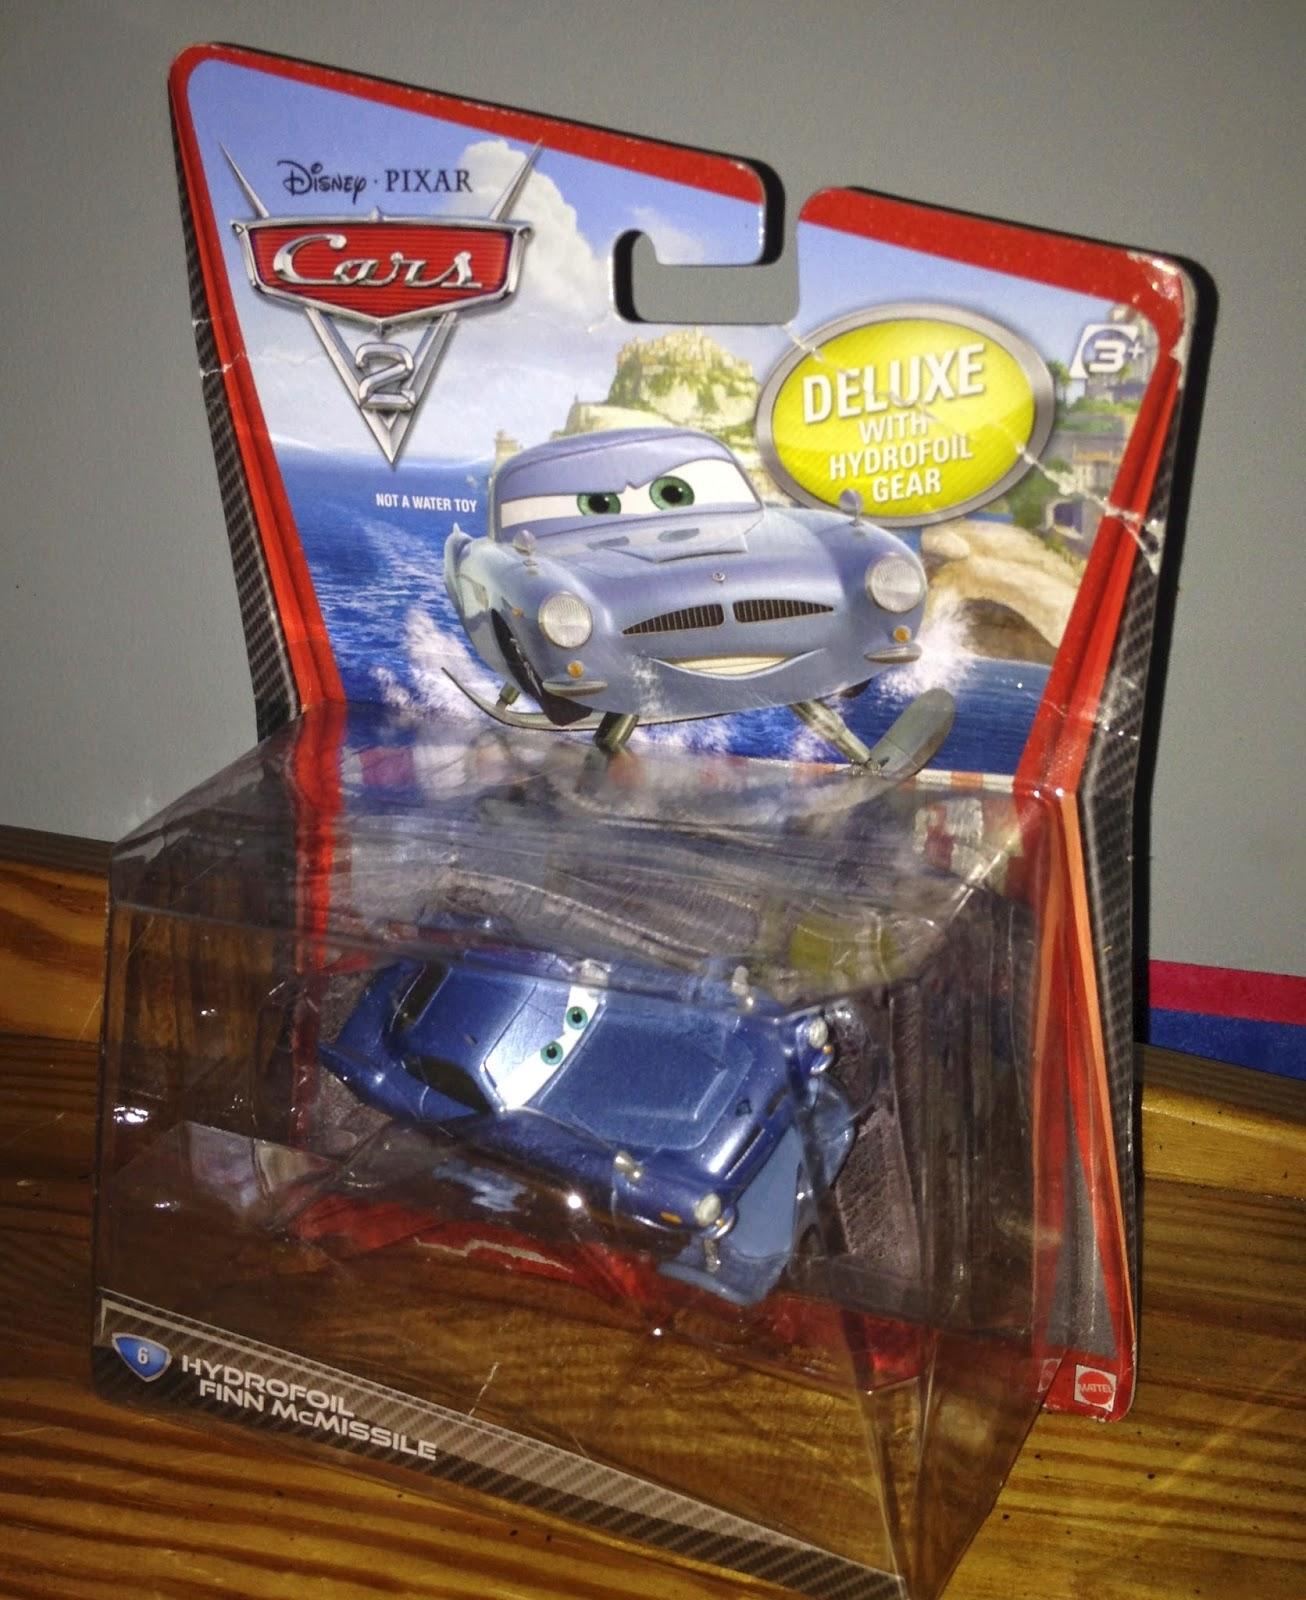 dan the pixar fan cars 2 hydrofoil finn mcmissile